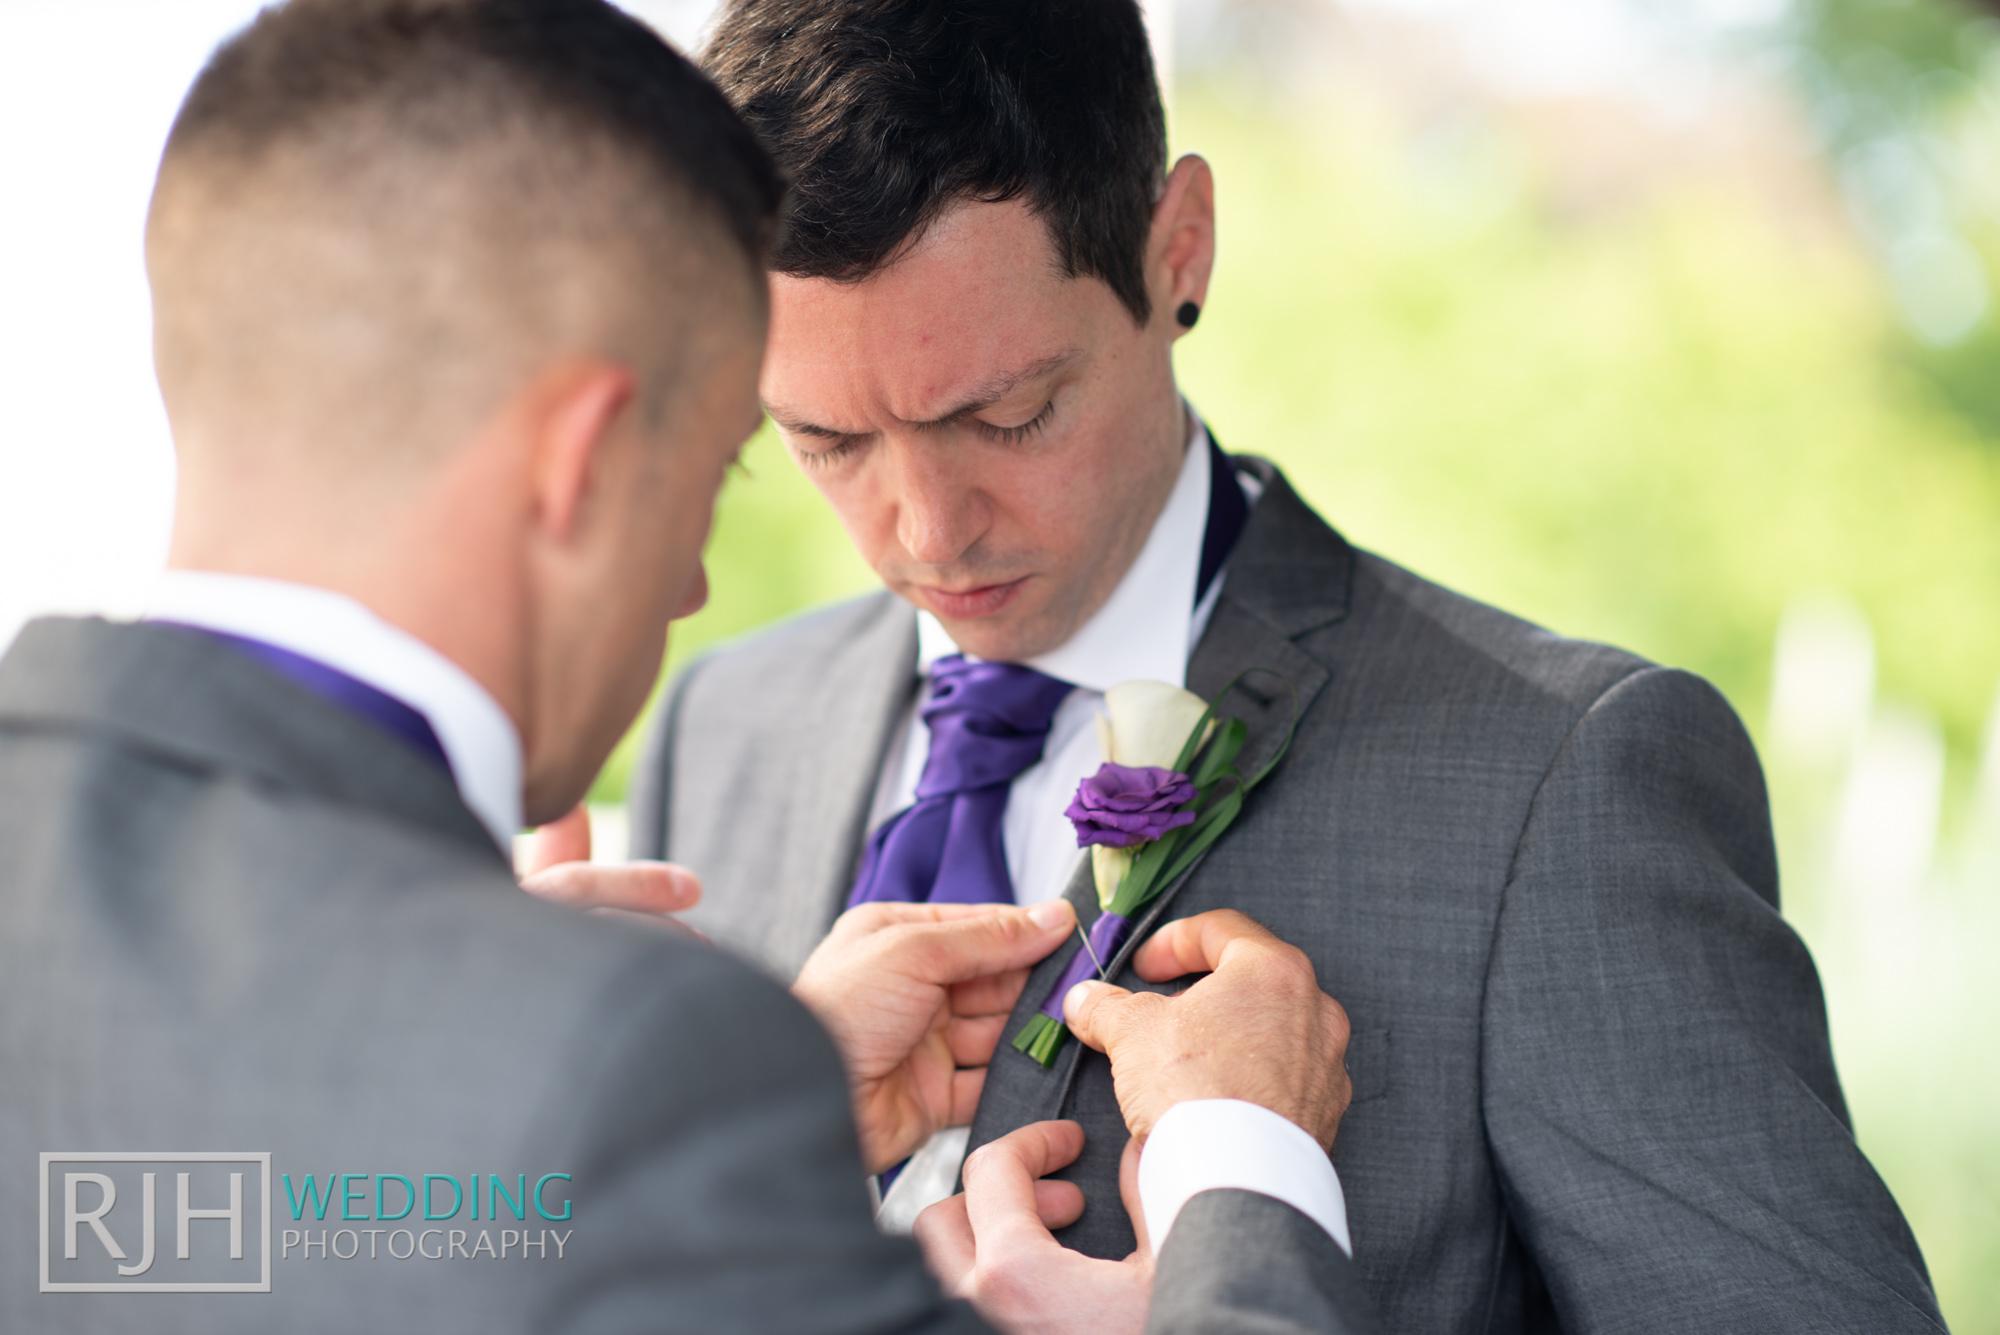 Oulton Hall Wedding Photography_Goodwill-Hall_005_DSC_2946.jpg